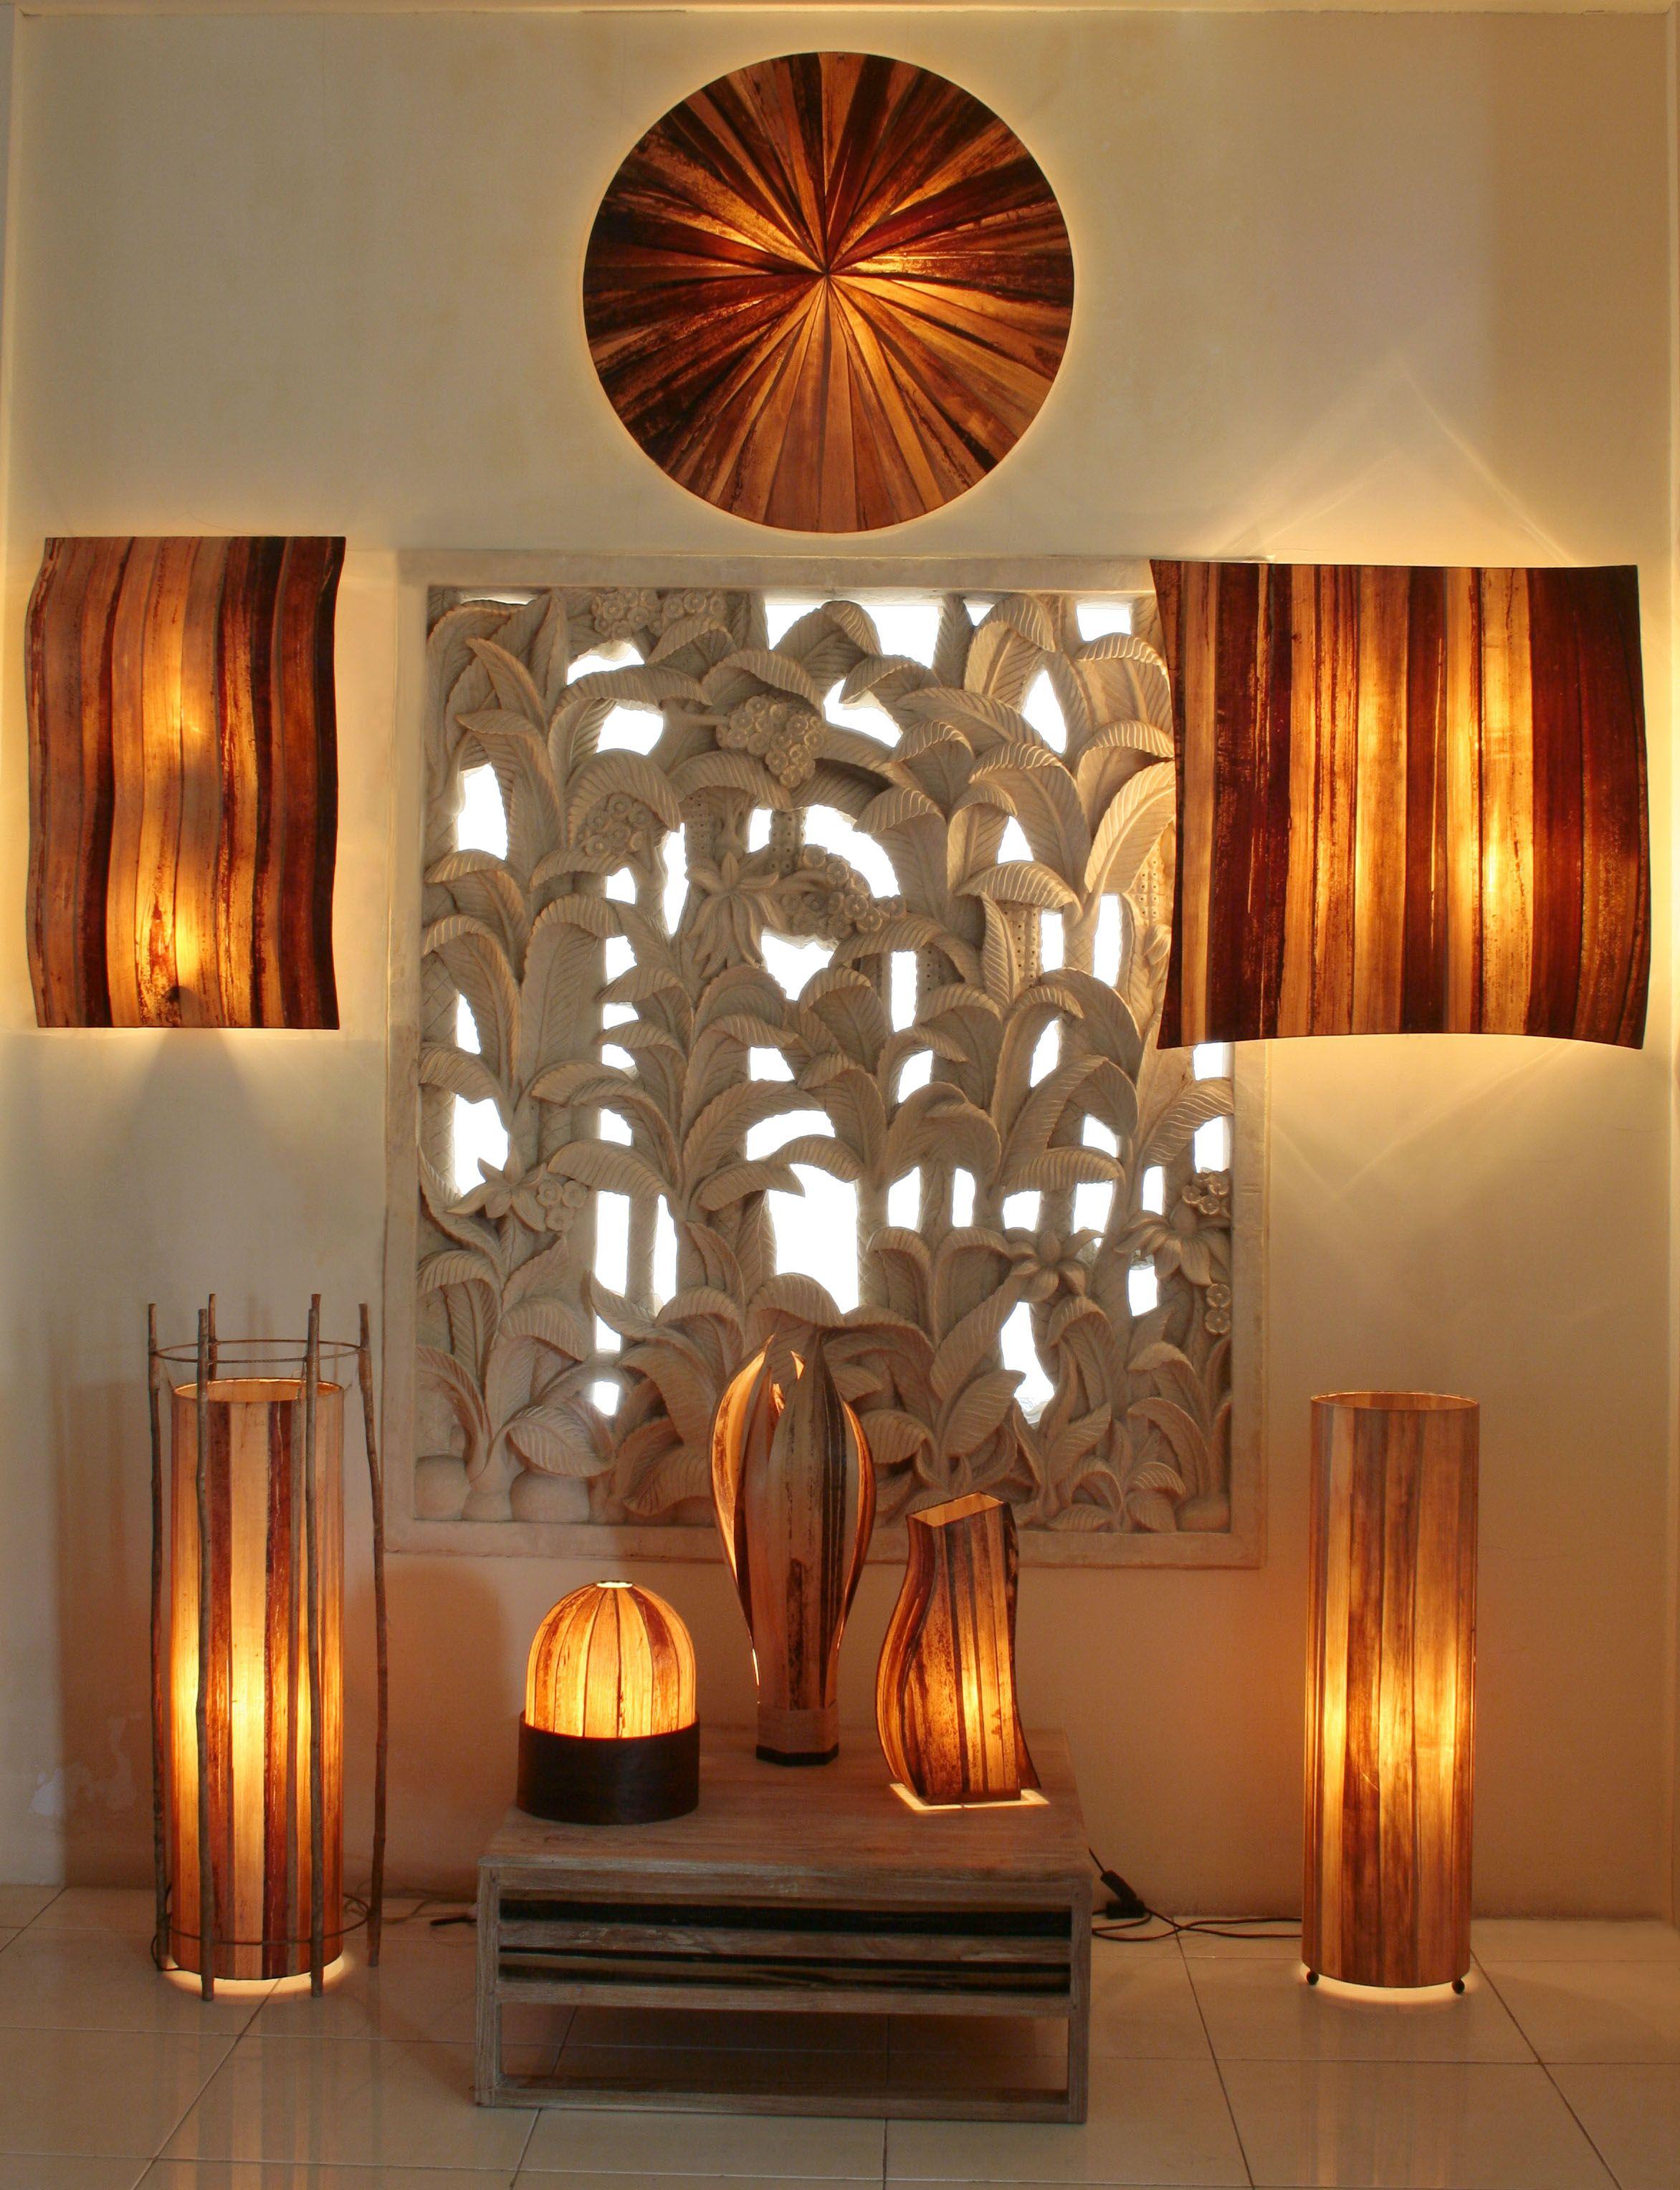 Lamp lamps lampshade lampshades lighting furniture handicraft lamp lamps lampshade lampshades lighting furniture handicraft bali aloadofball Gallery